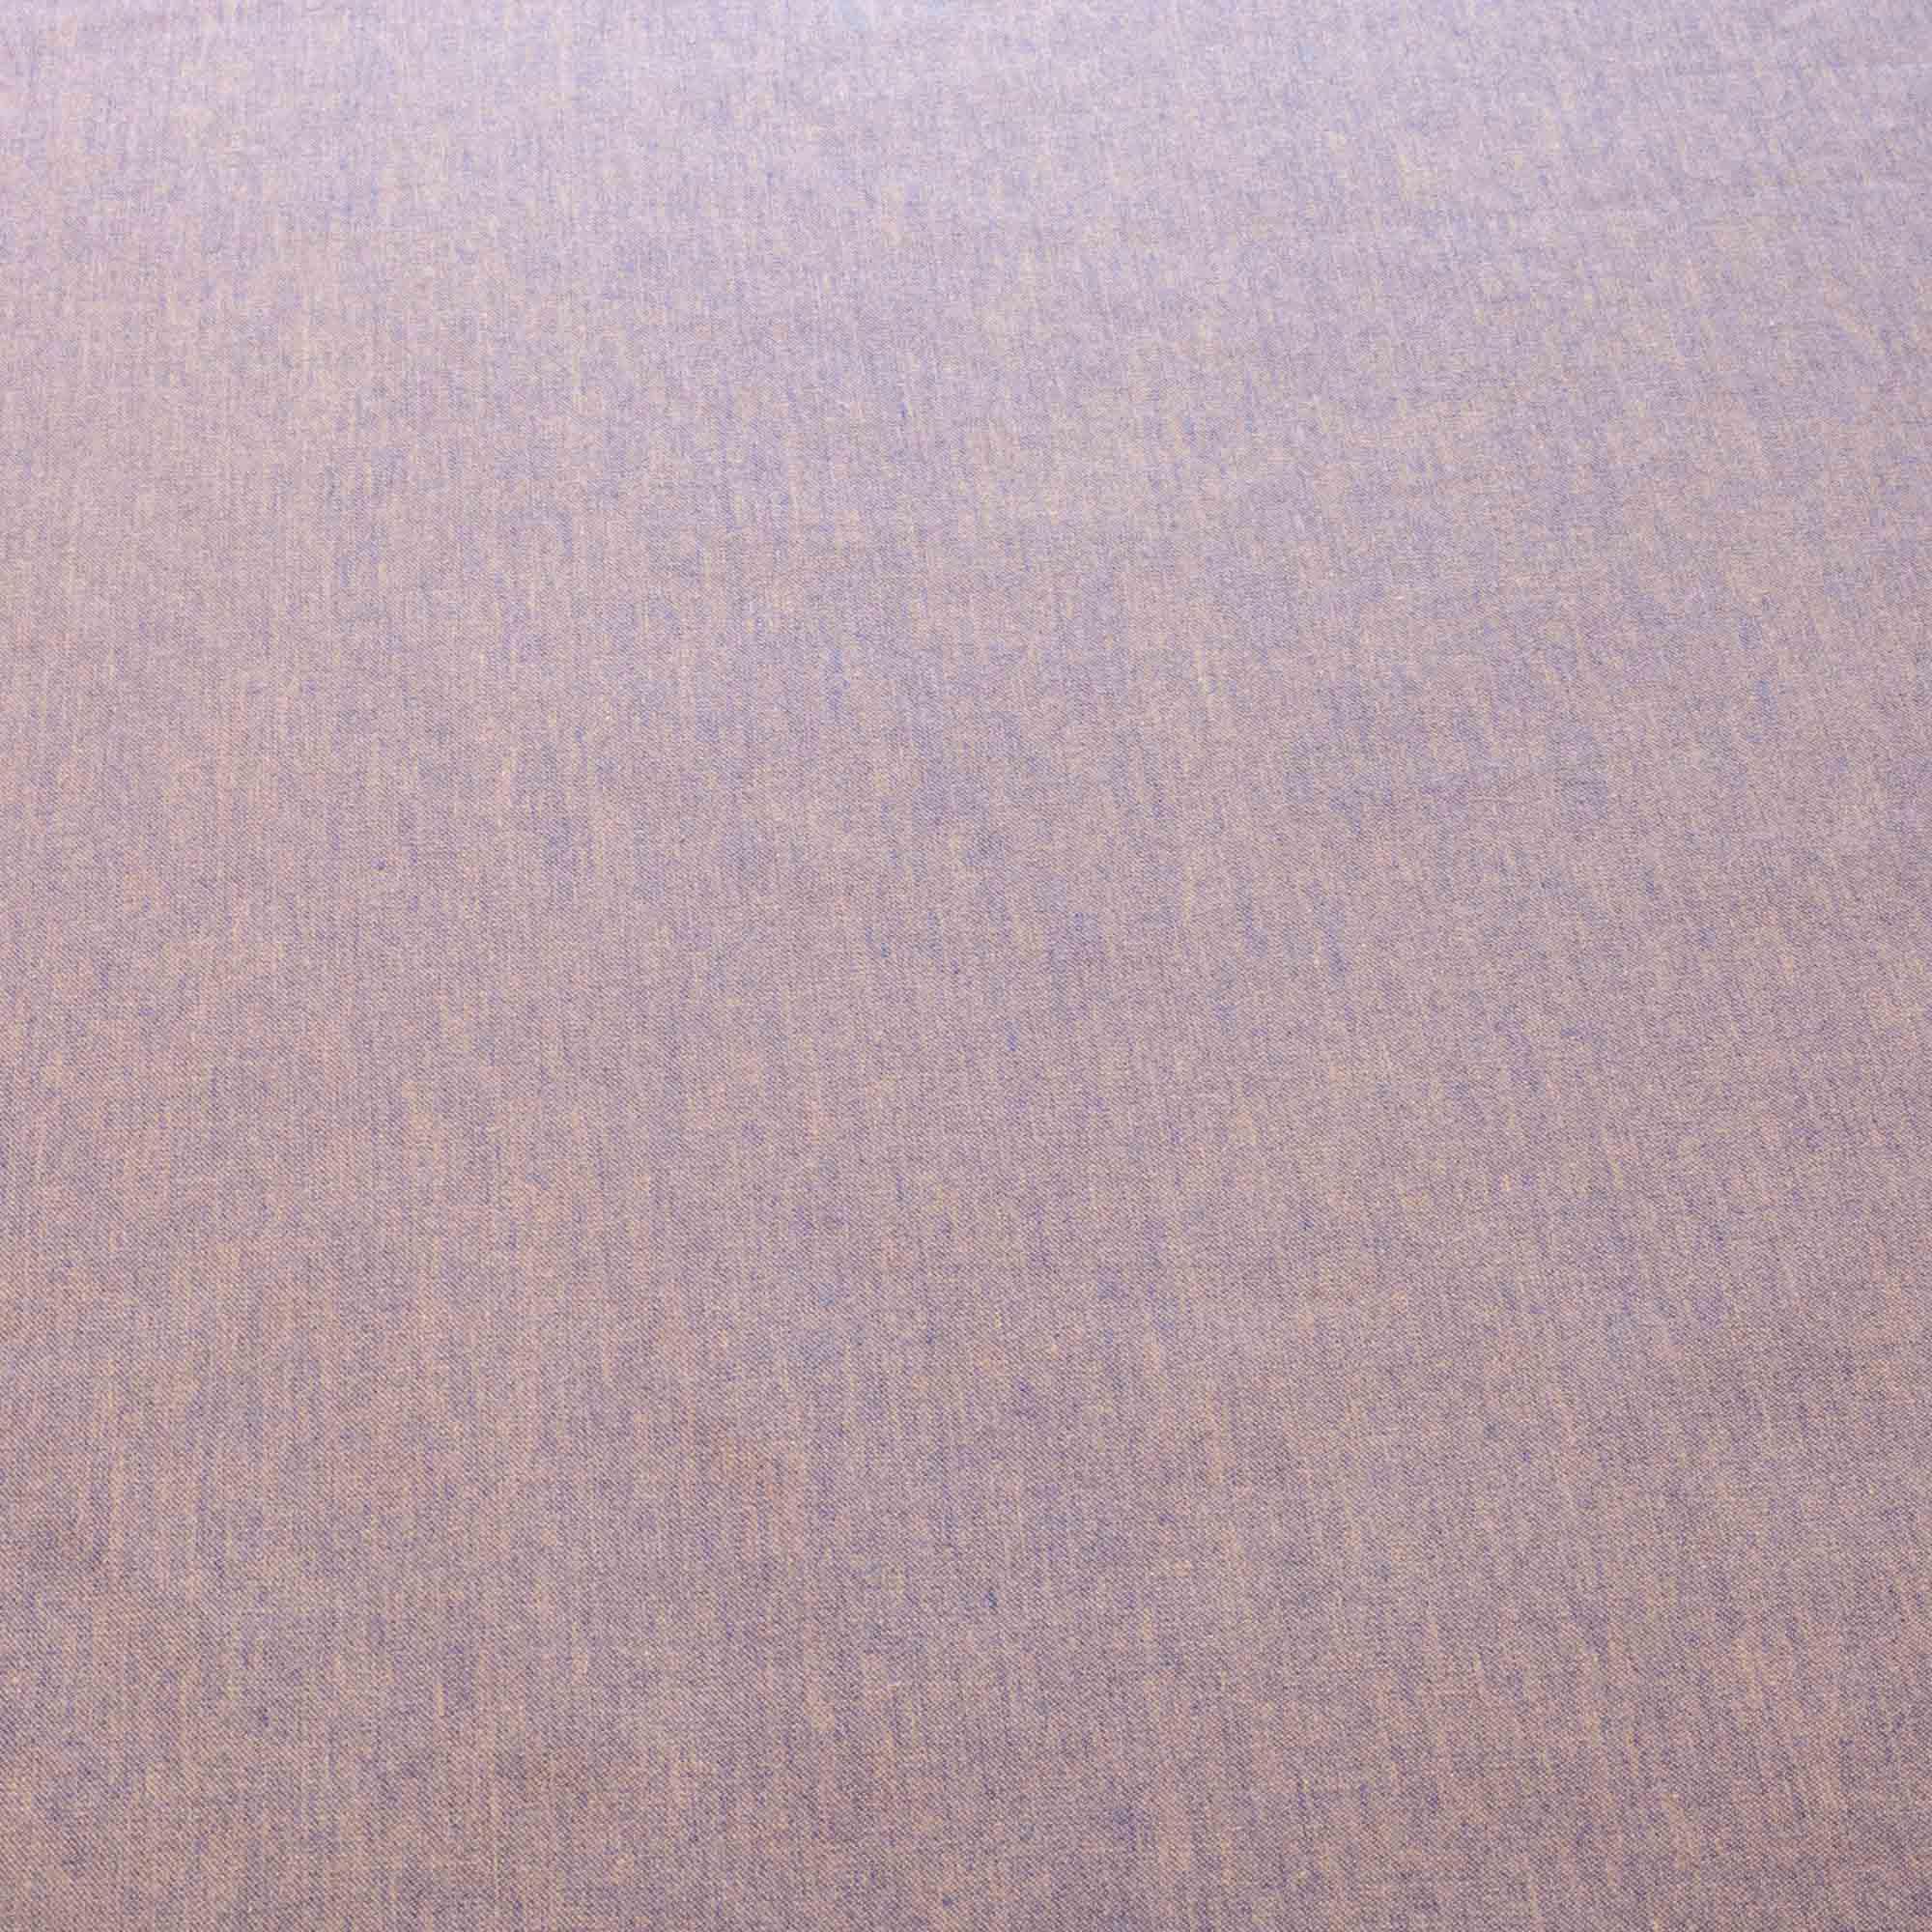 Tecido Chambray Jeans Leve Azul Claro 100% Algodão 1,40 m Largura